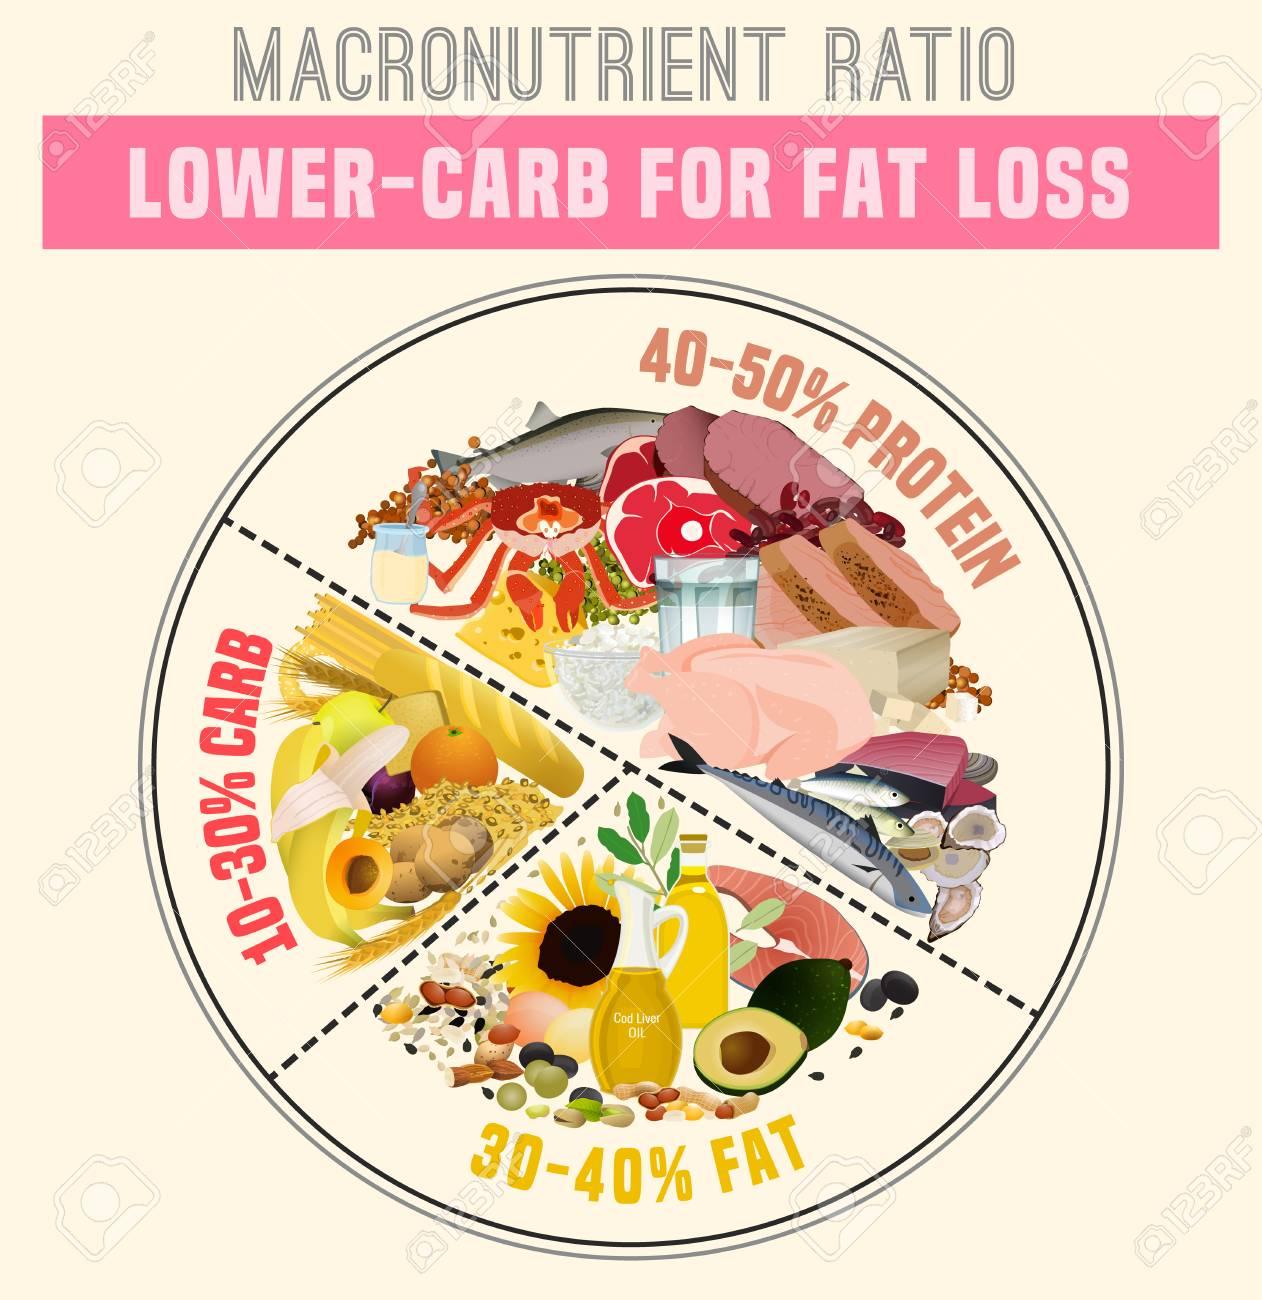 Low Carbohydrate Diet Diagram Macronutrient Ratio Poster Fat